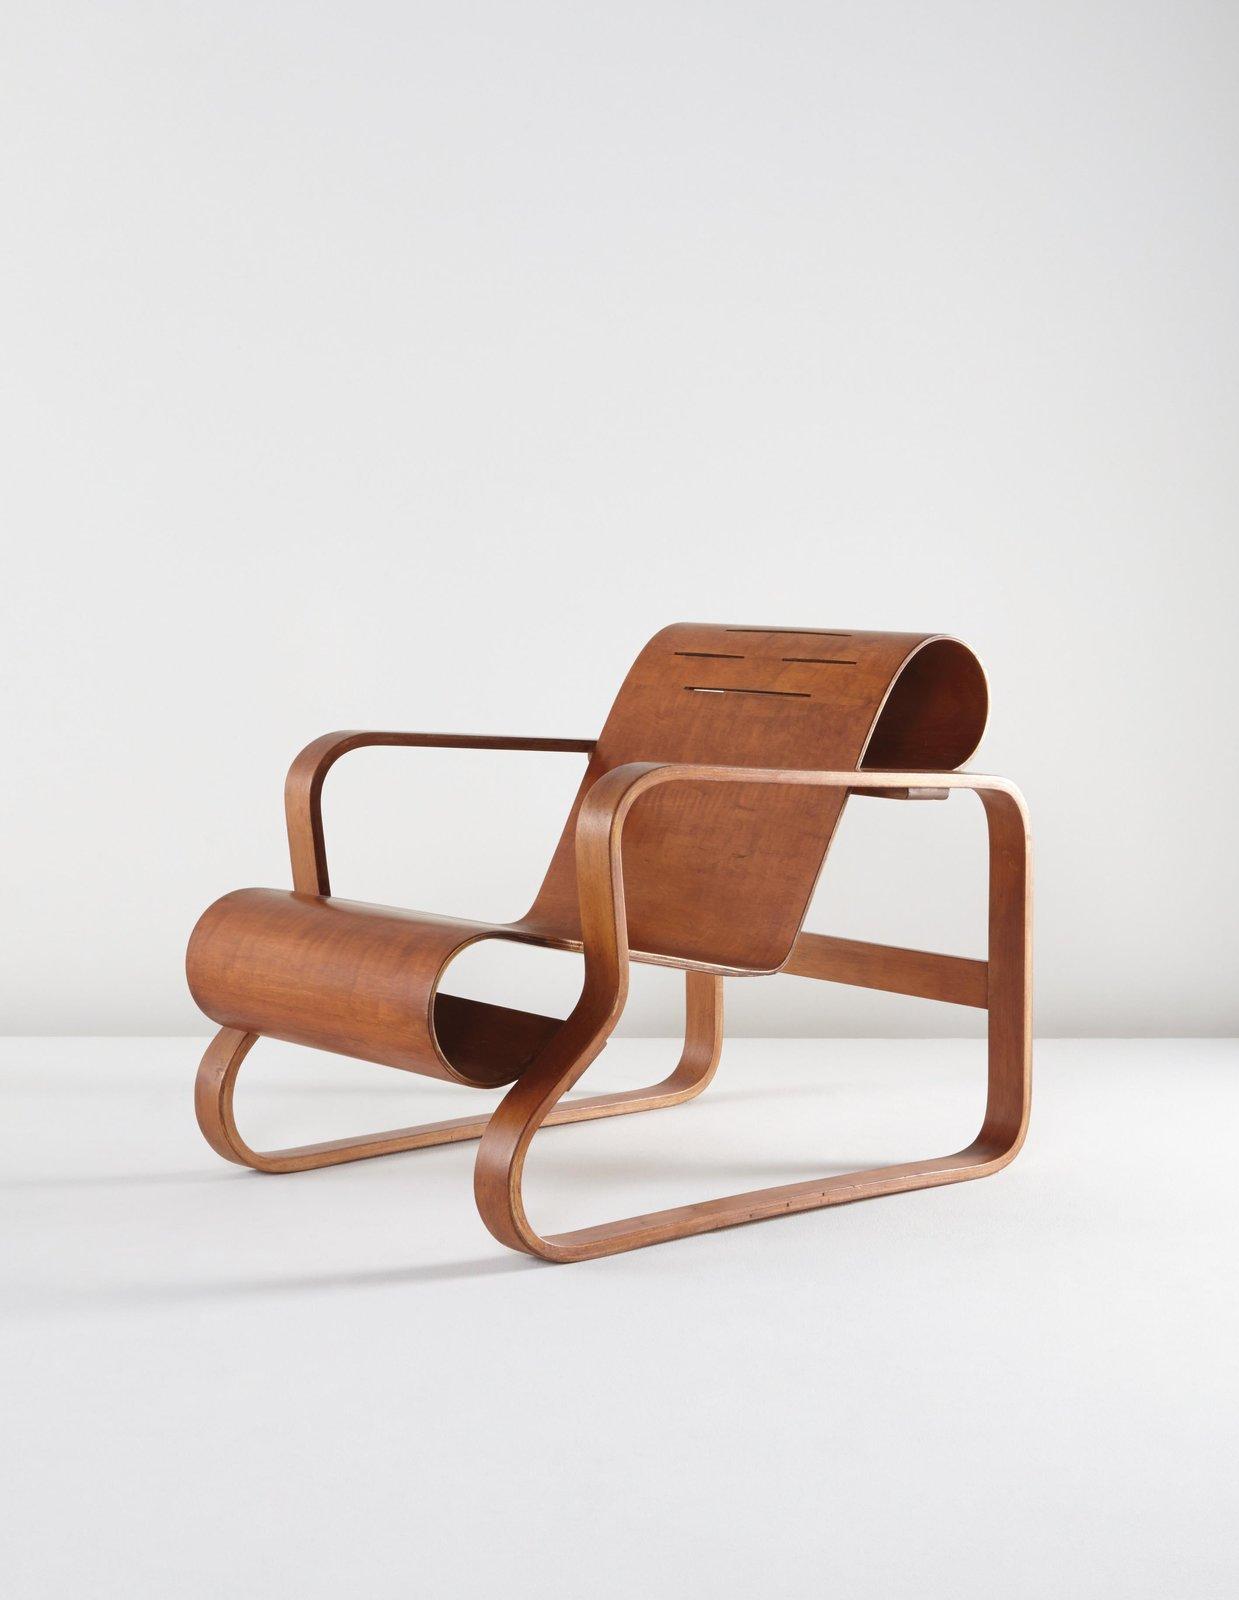 Alvar Aalto, early Paimio armchair, model 41/83C, circa 1935.  Photo Phillips.